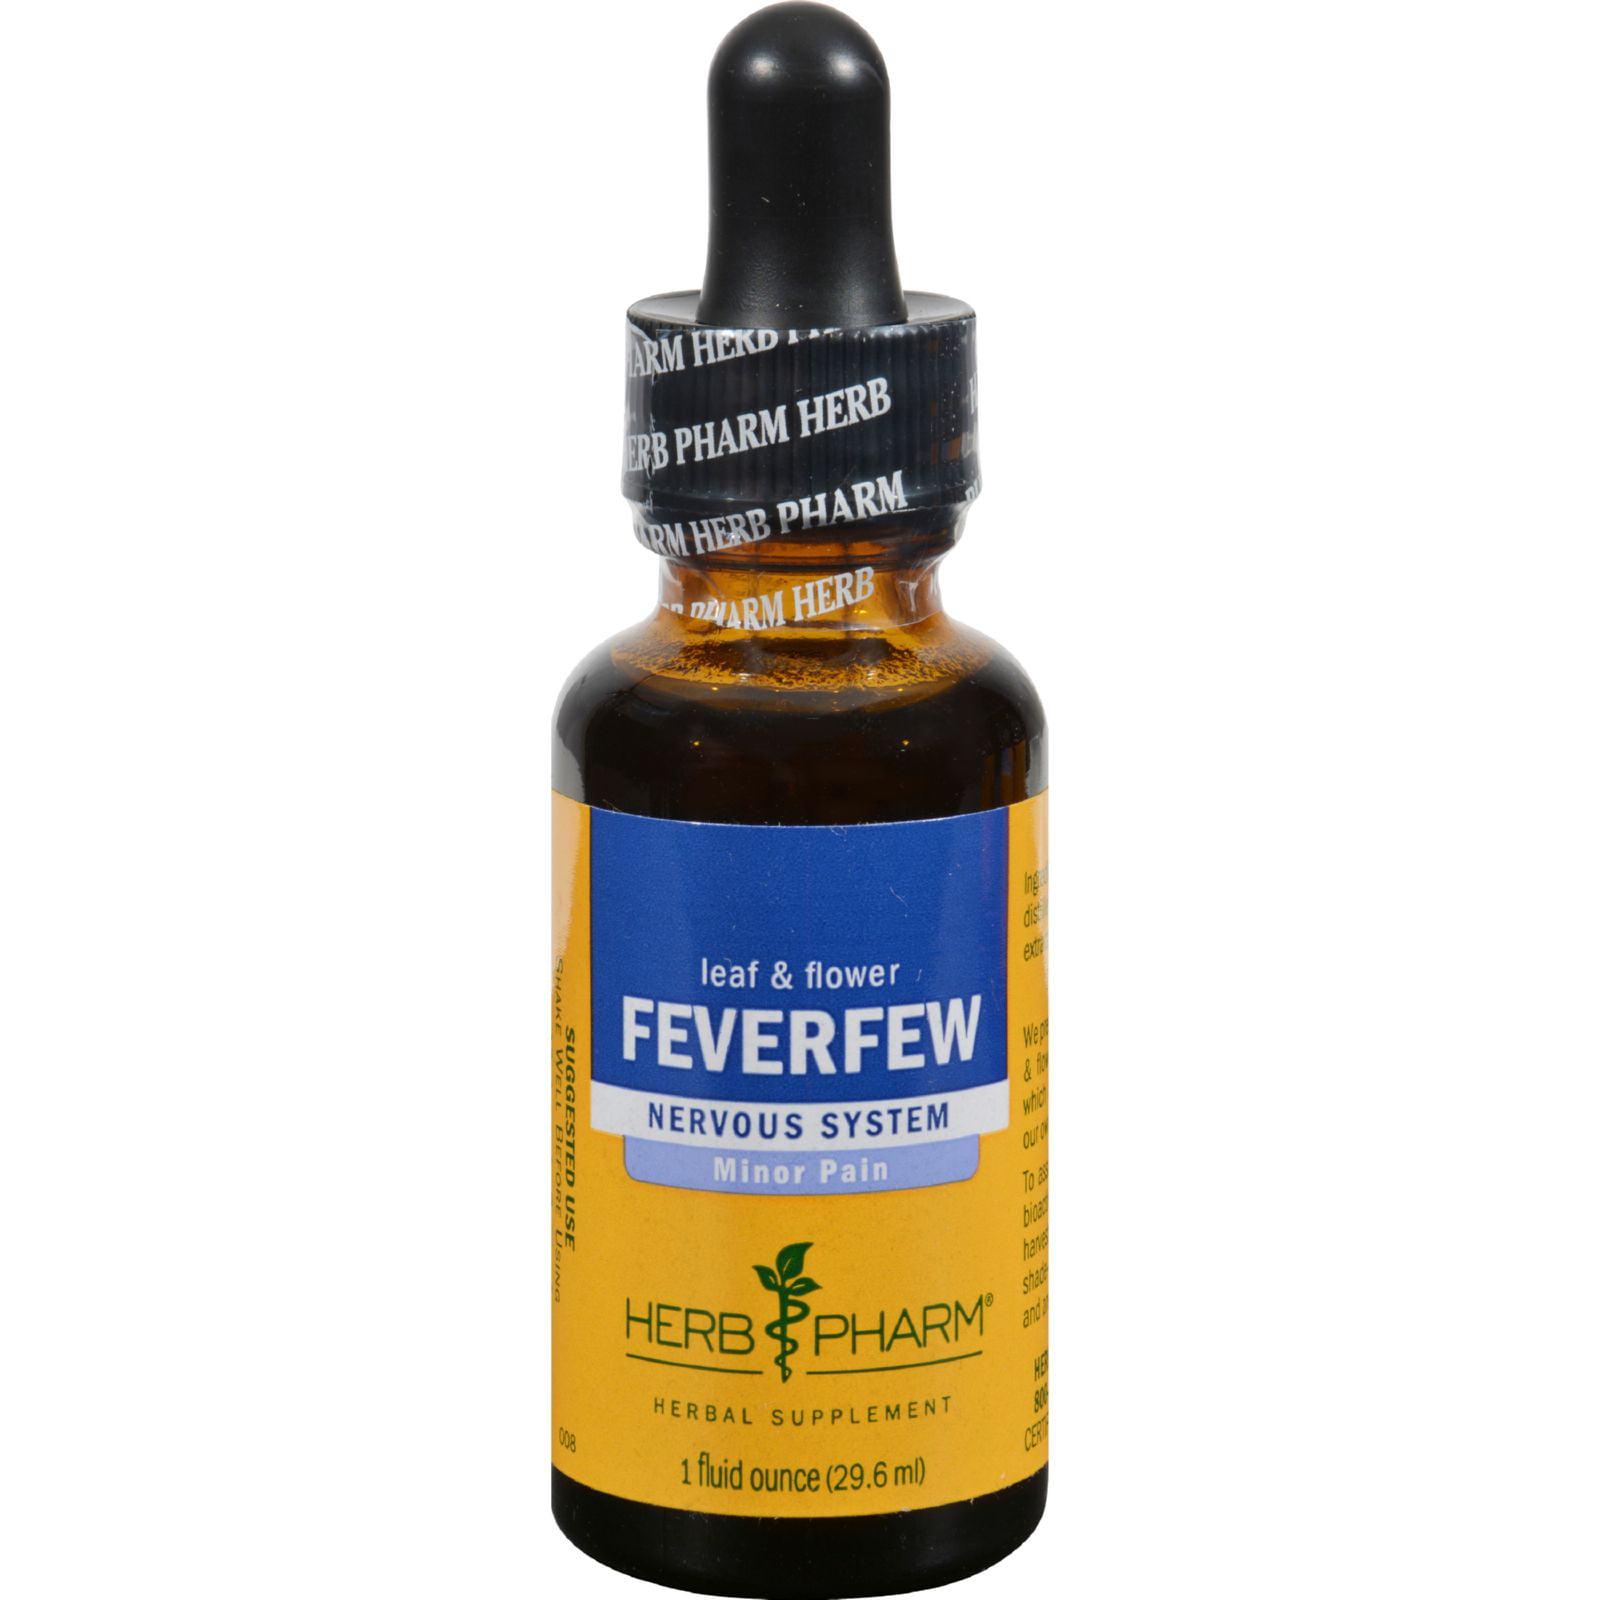 Herb Pharm Feverfew Liquid Herbal Extract - 1 fl oz